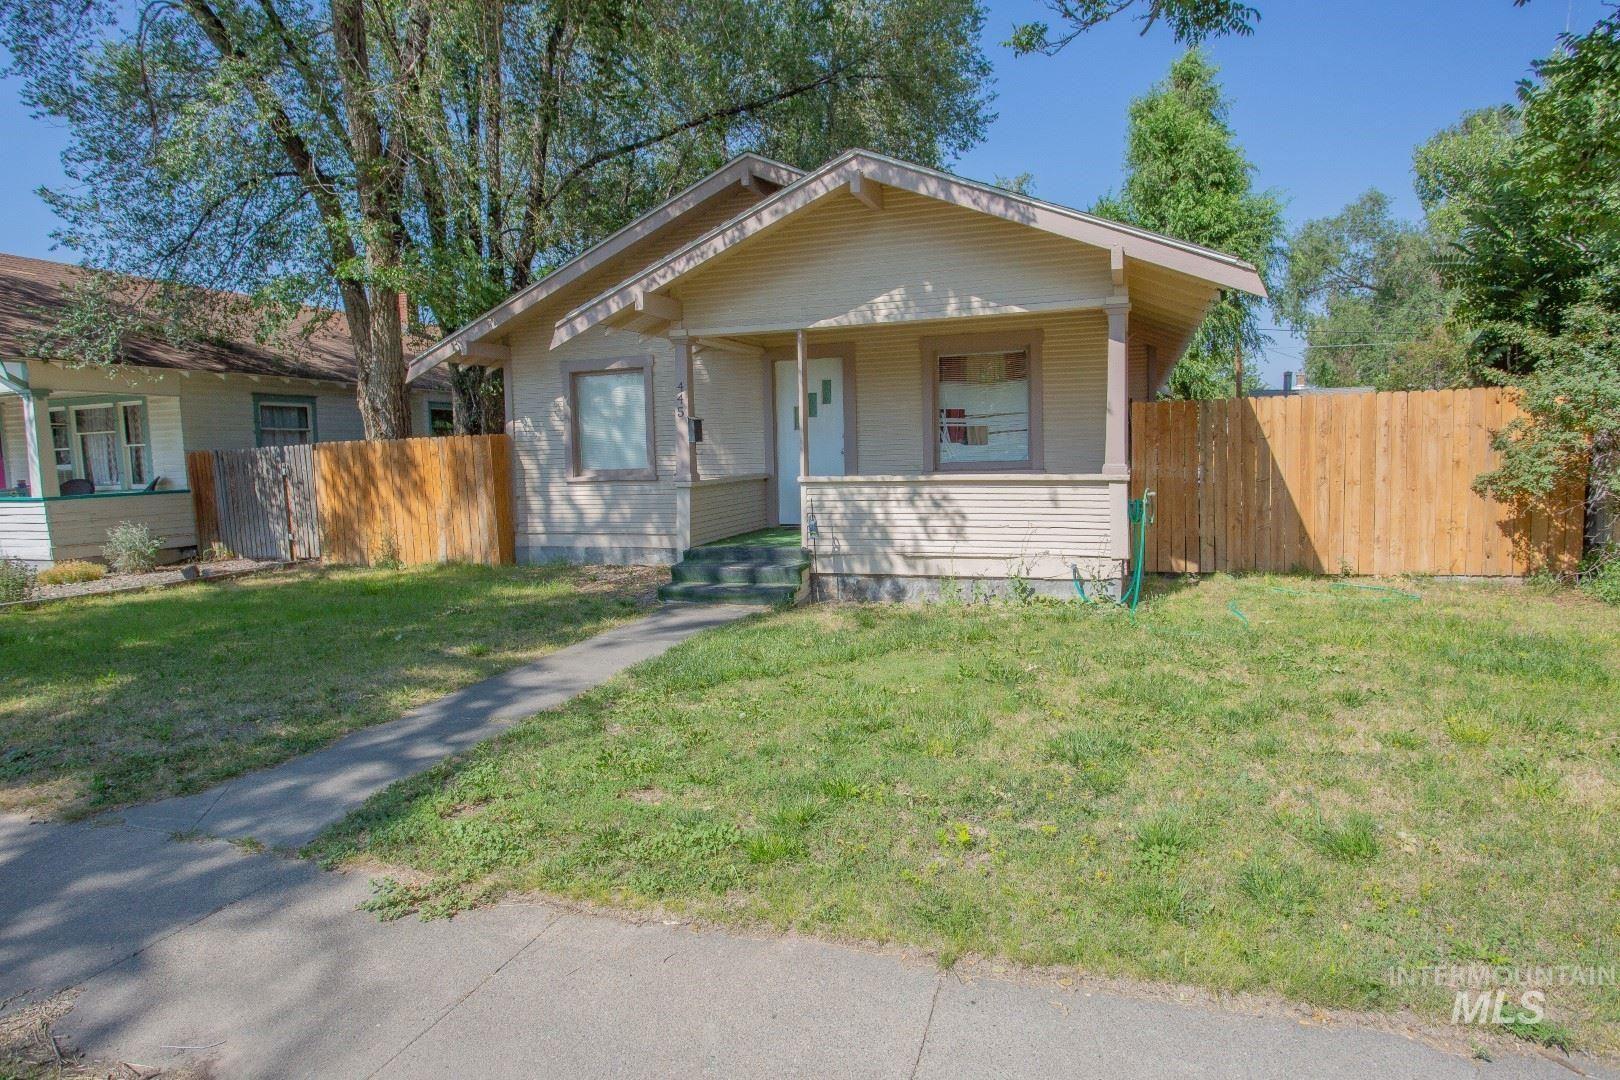 Photo of 445 E 5th Ave, Twin Falls, ID 83301 (MLS # 98776102)